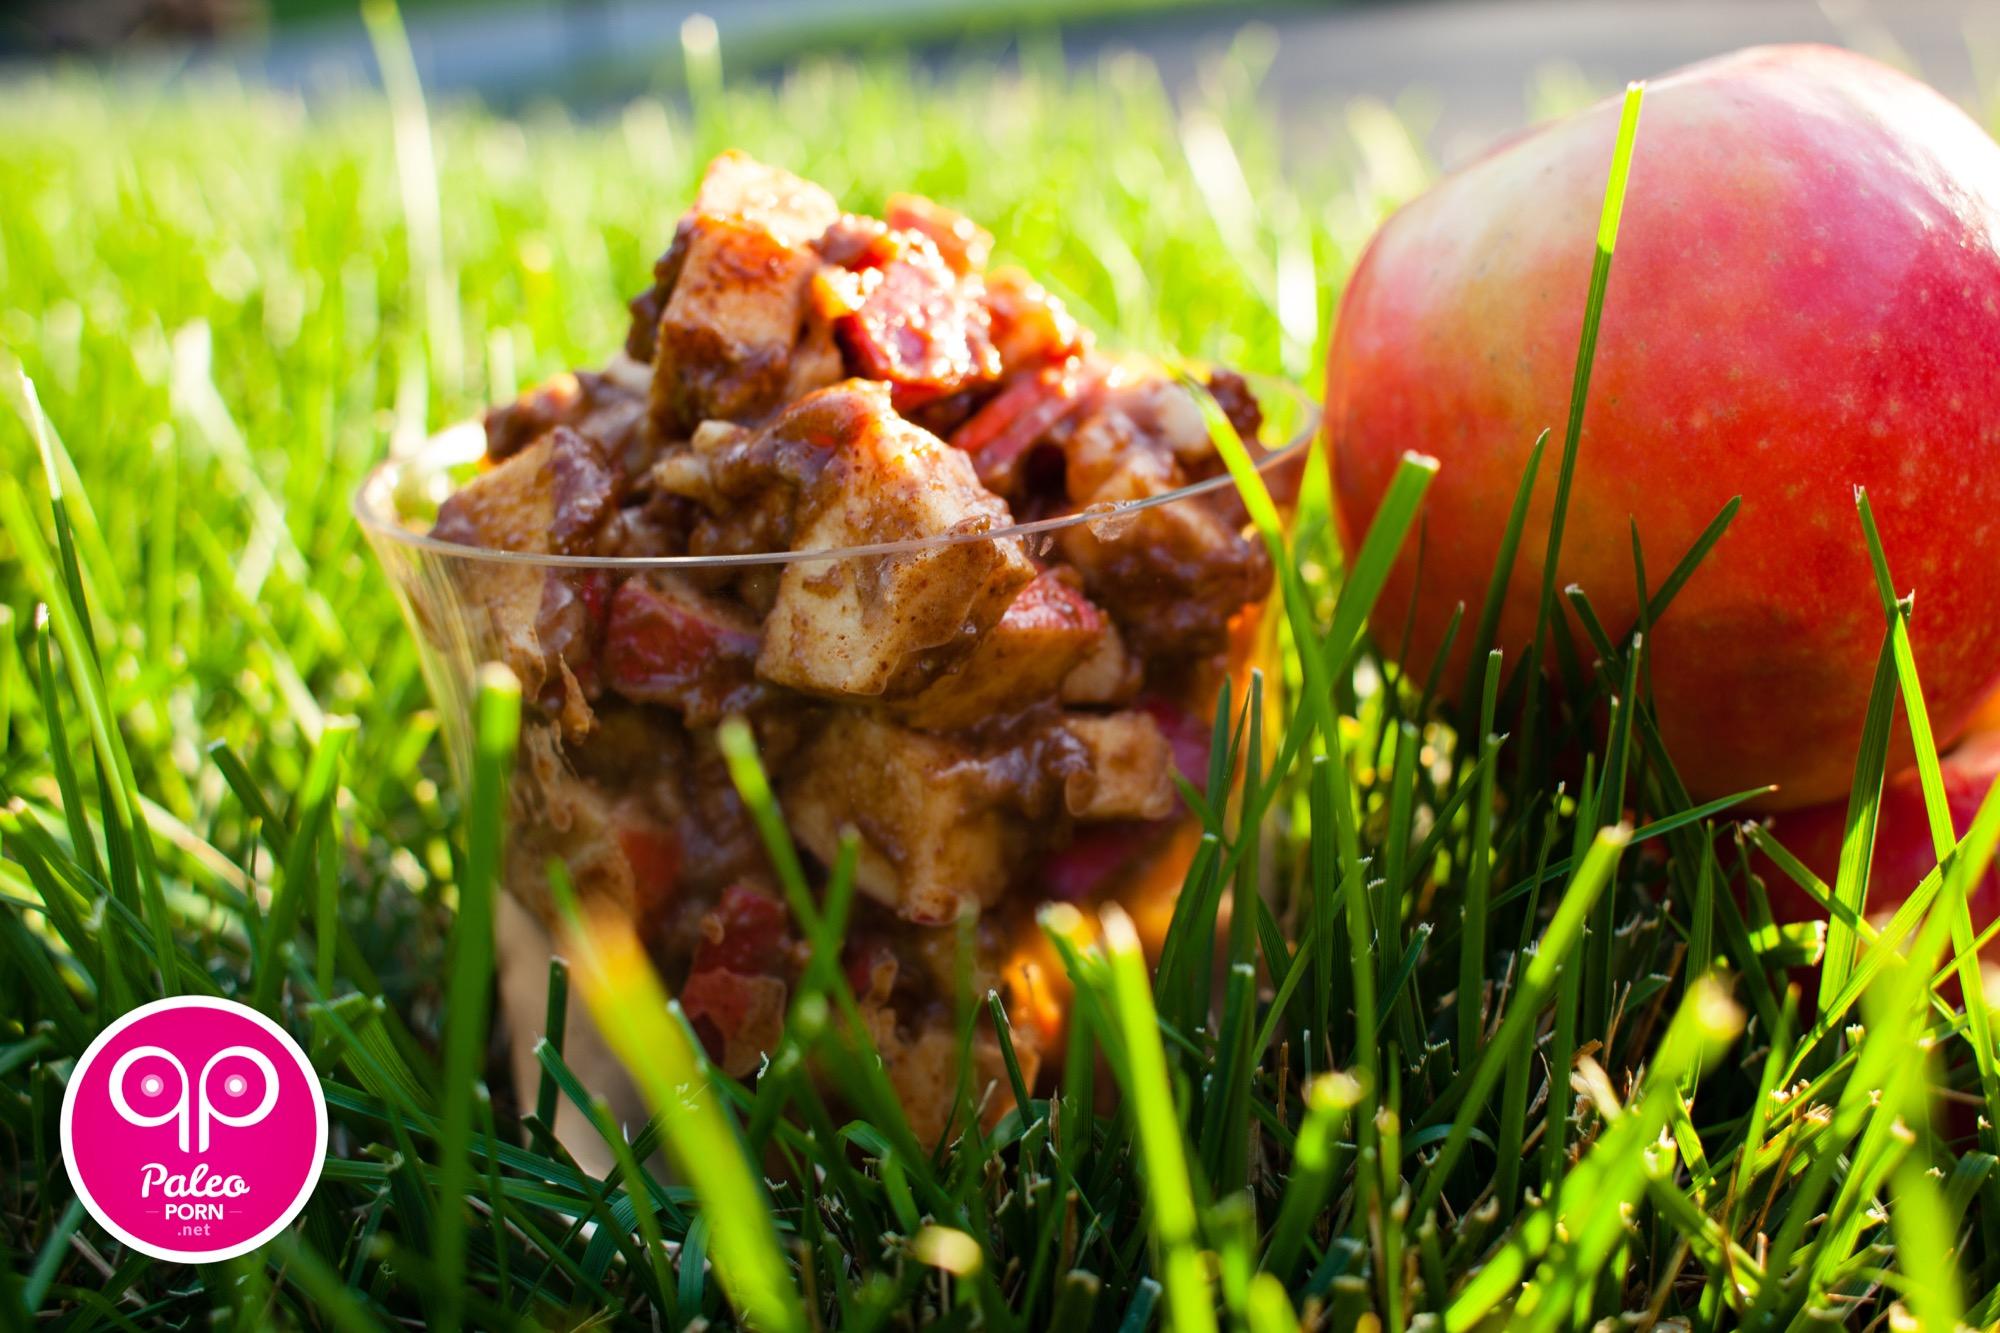 Apple Pie Porn paleo apple pie in a bowl